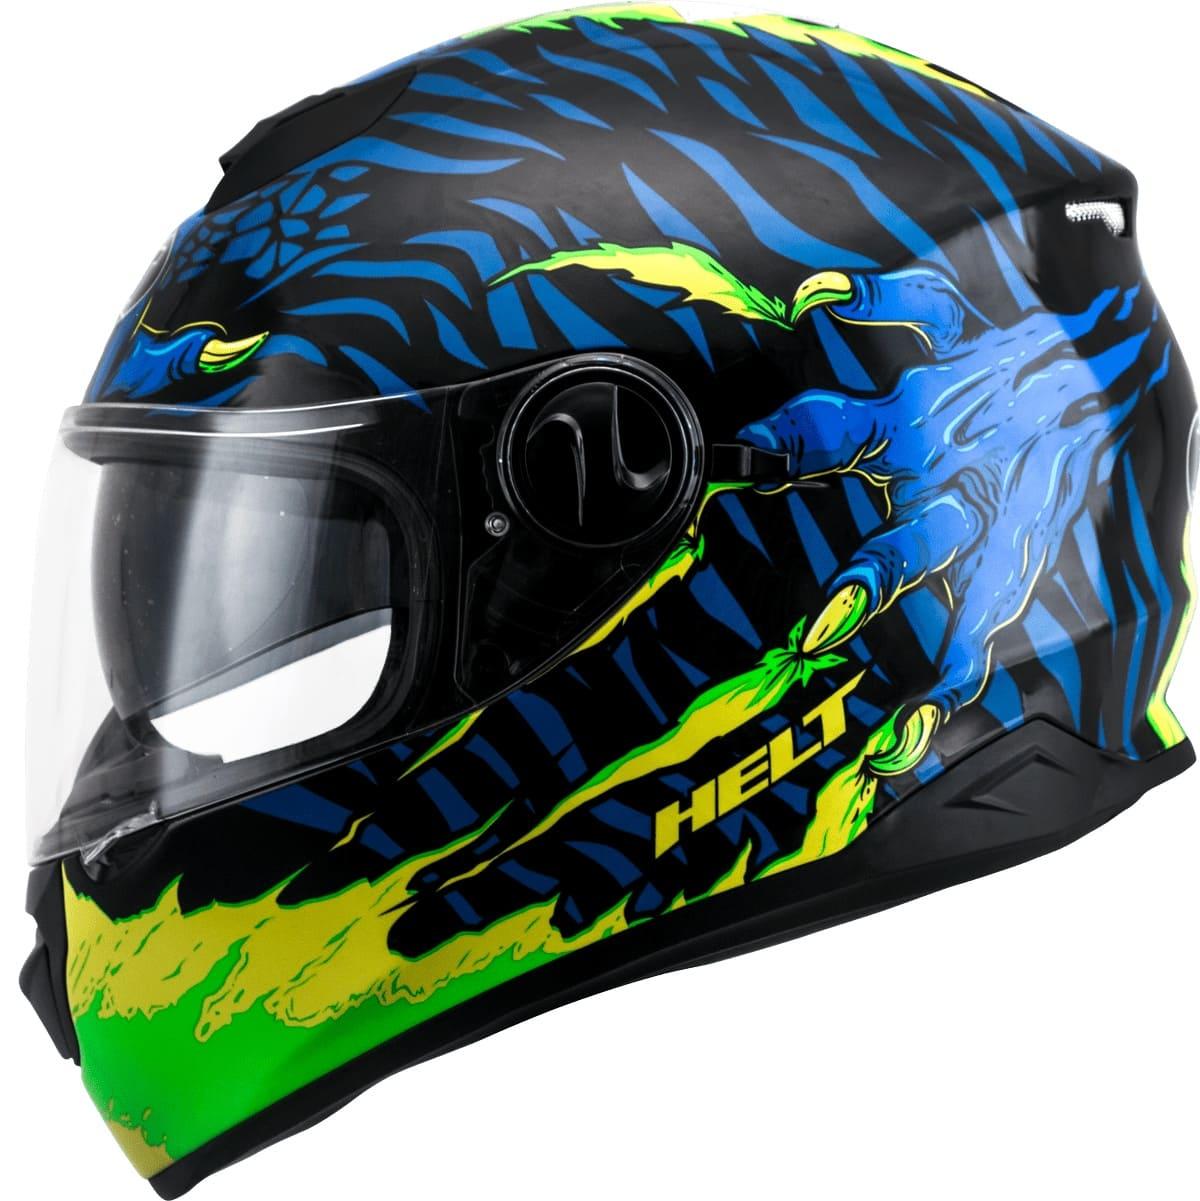 Capacete Helt 965 New Race Glass Monster C/ Óculos Interno Fumê